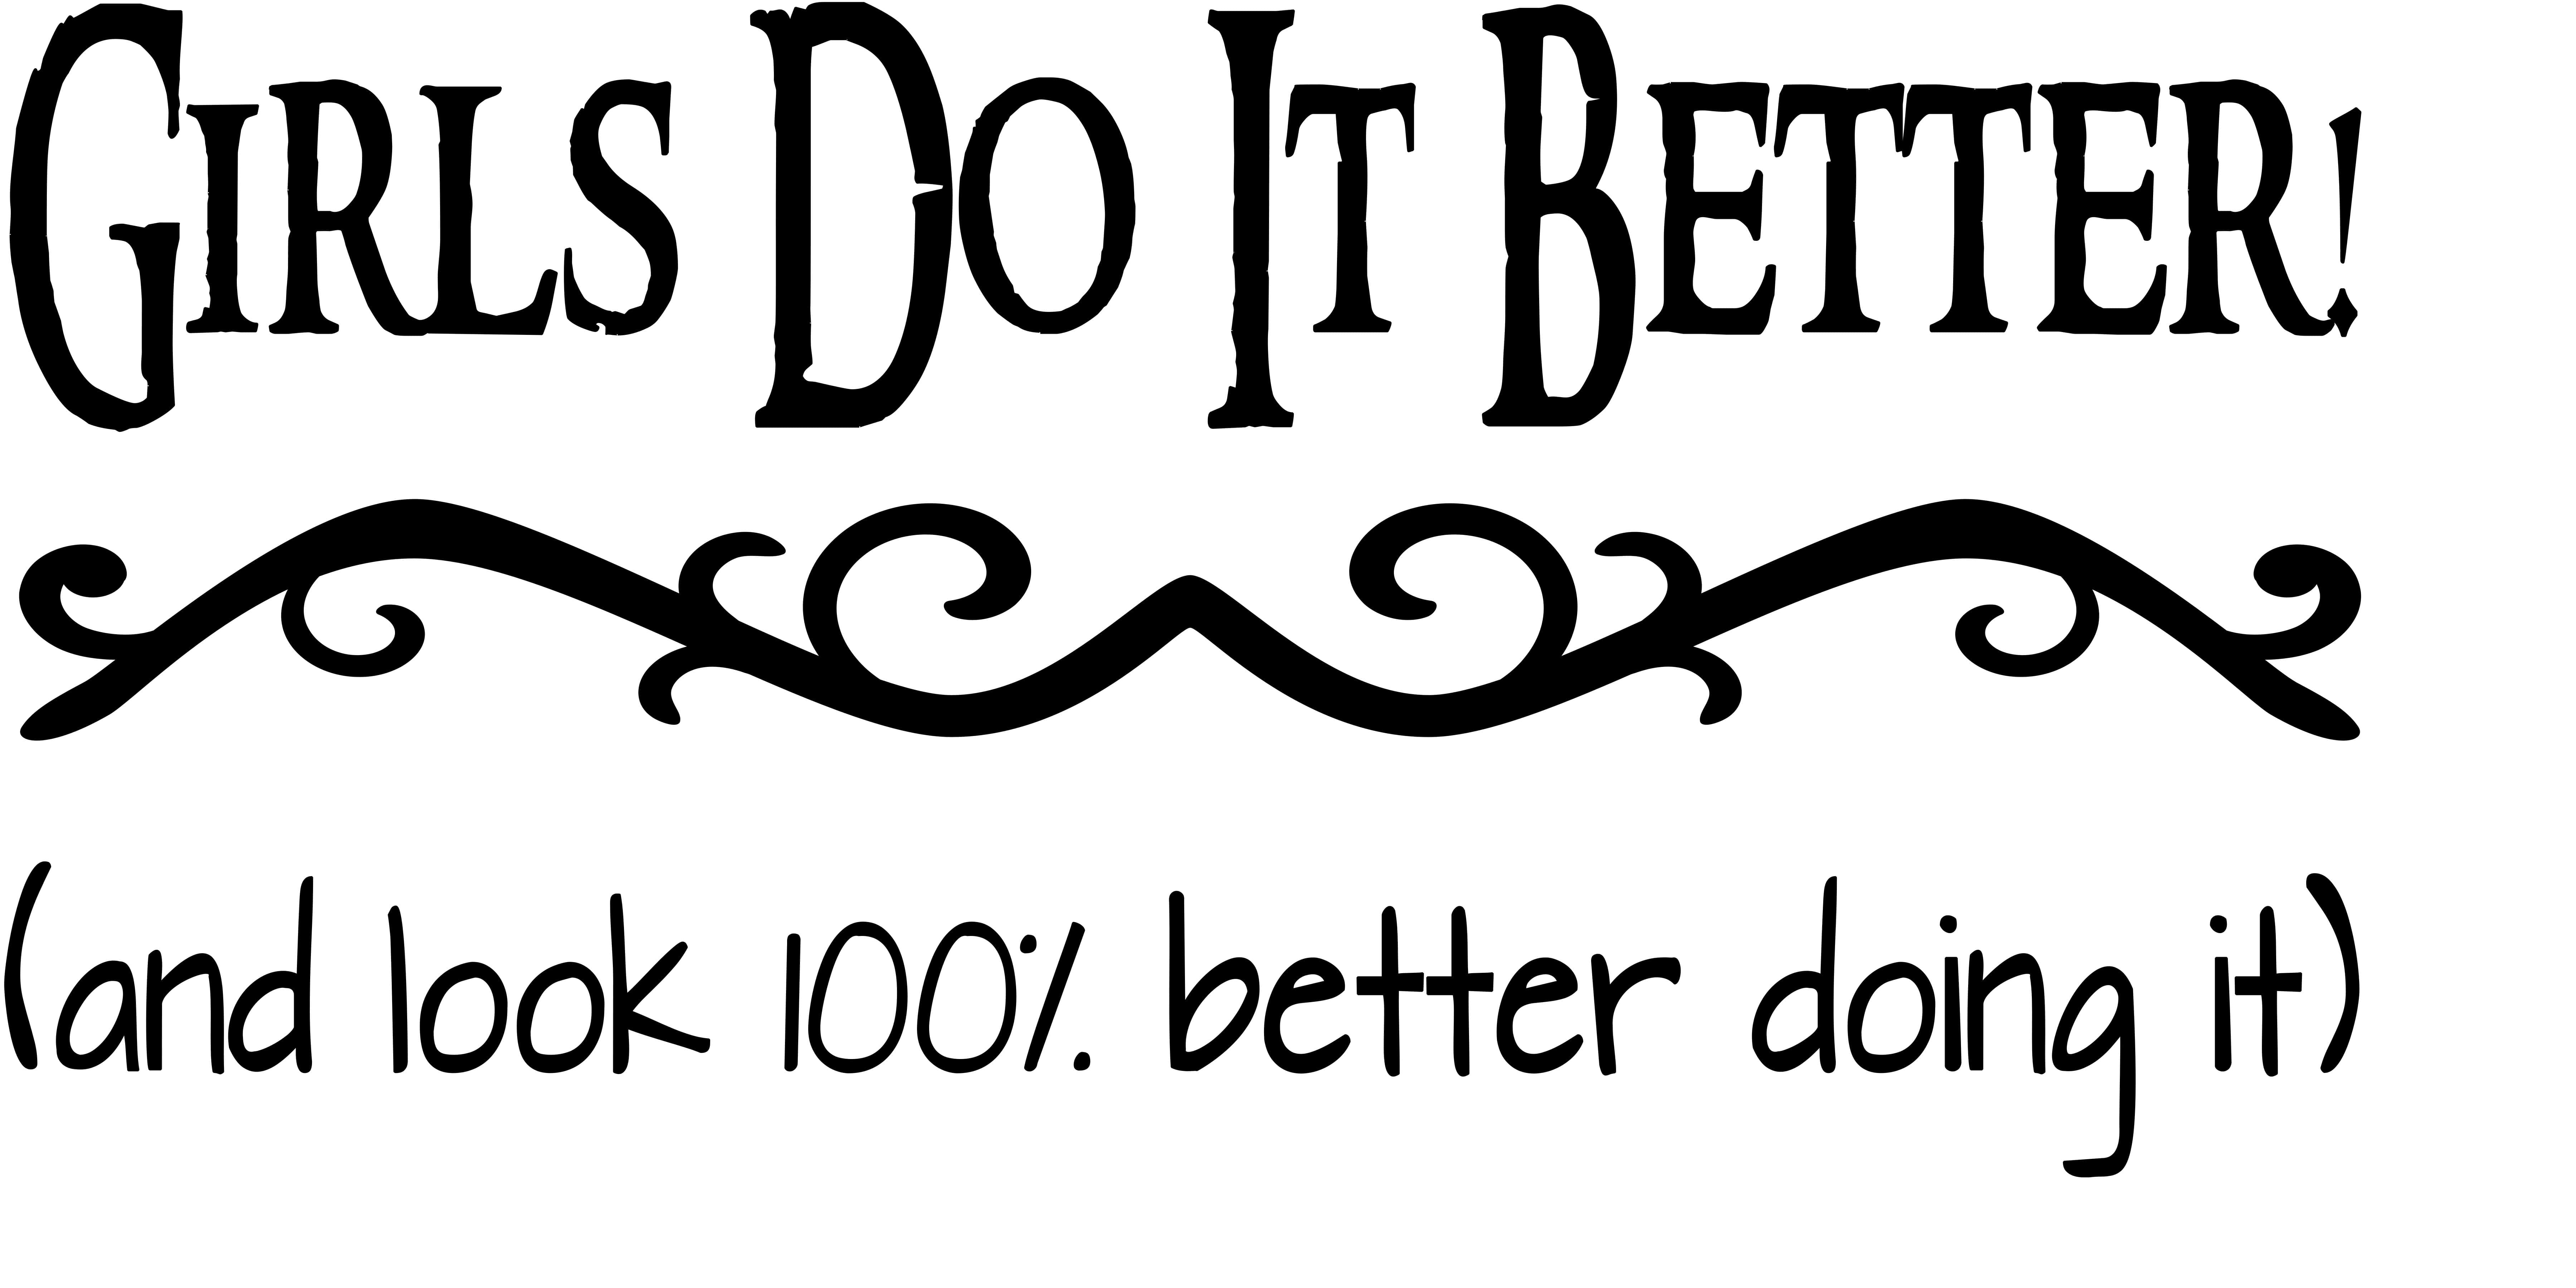 Girls Do It Better ~ Self Esteem Building Vinyl Wall Decal by Scripture Wall Art - 11 x 22 Black Image